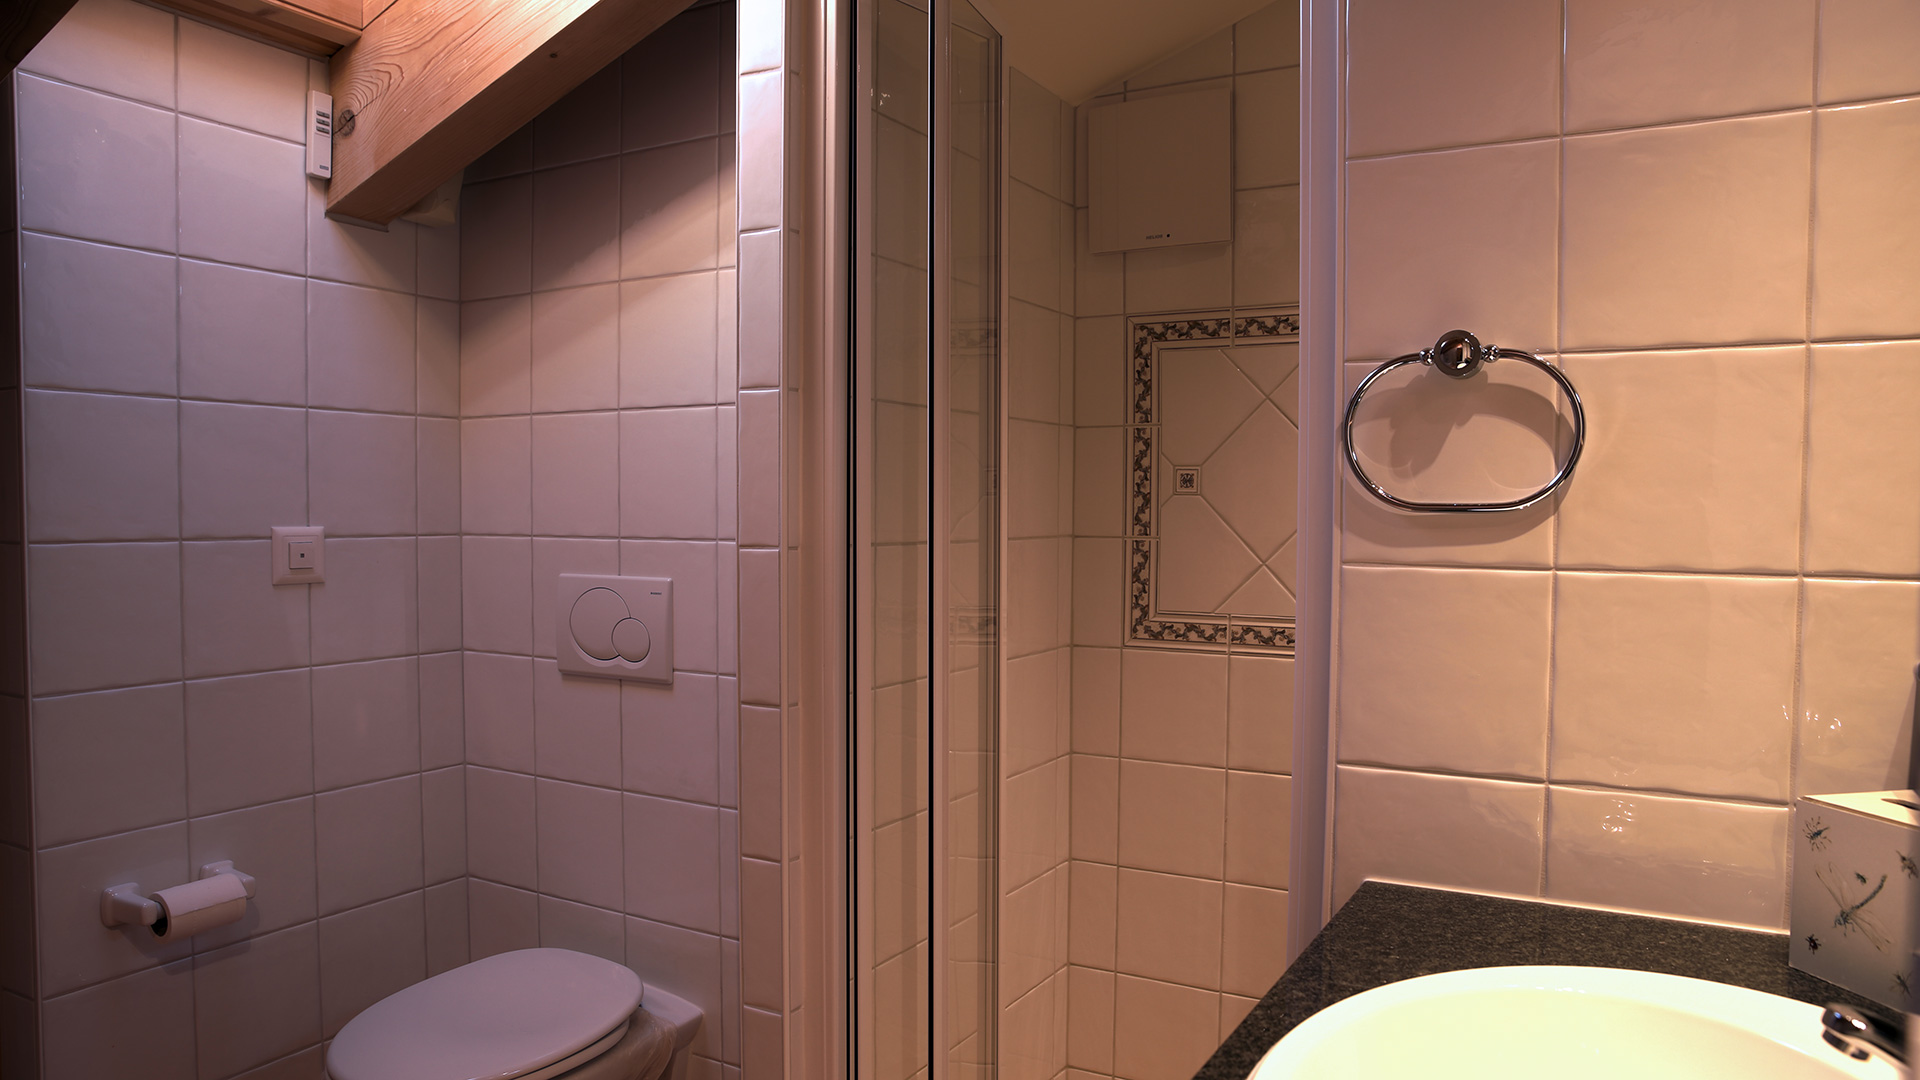 Cristal 43 Apartments, Switzerland